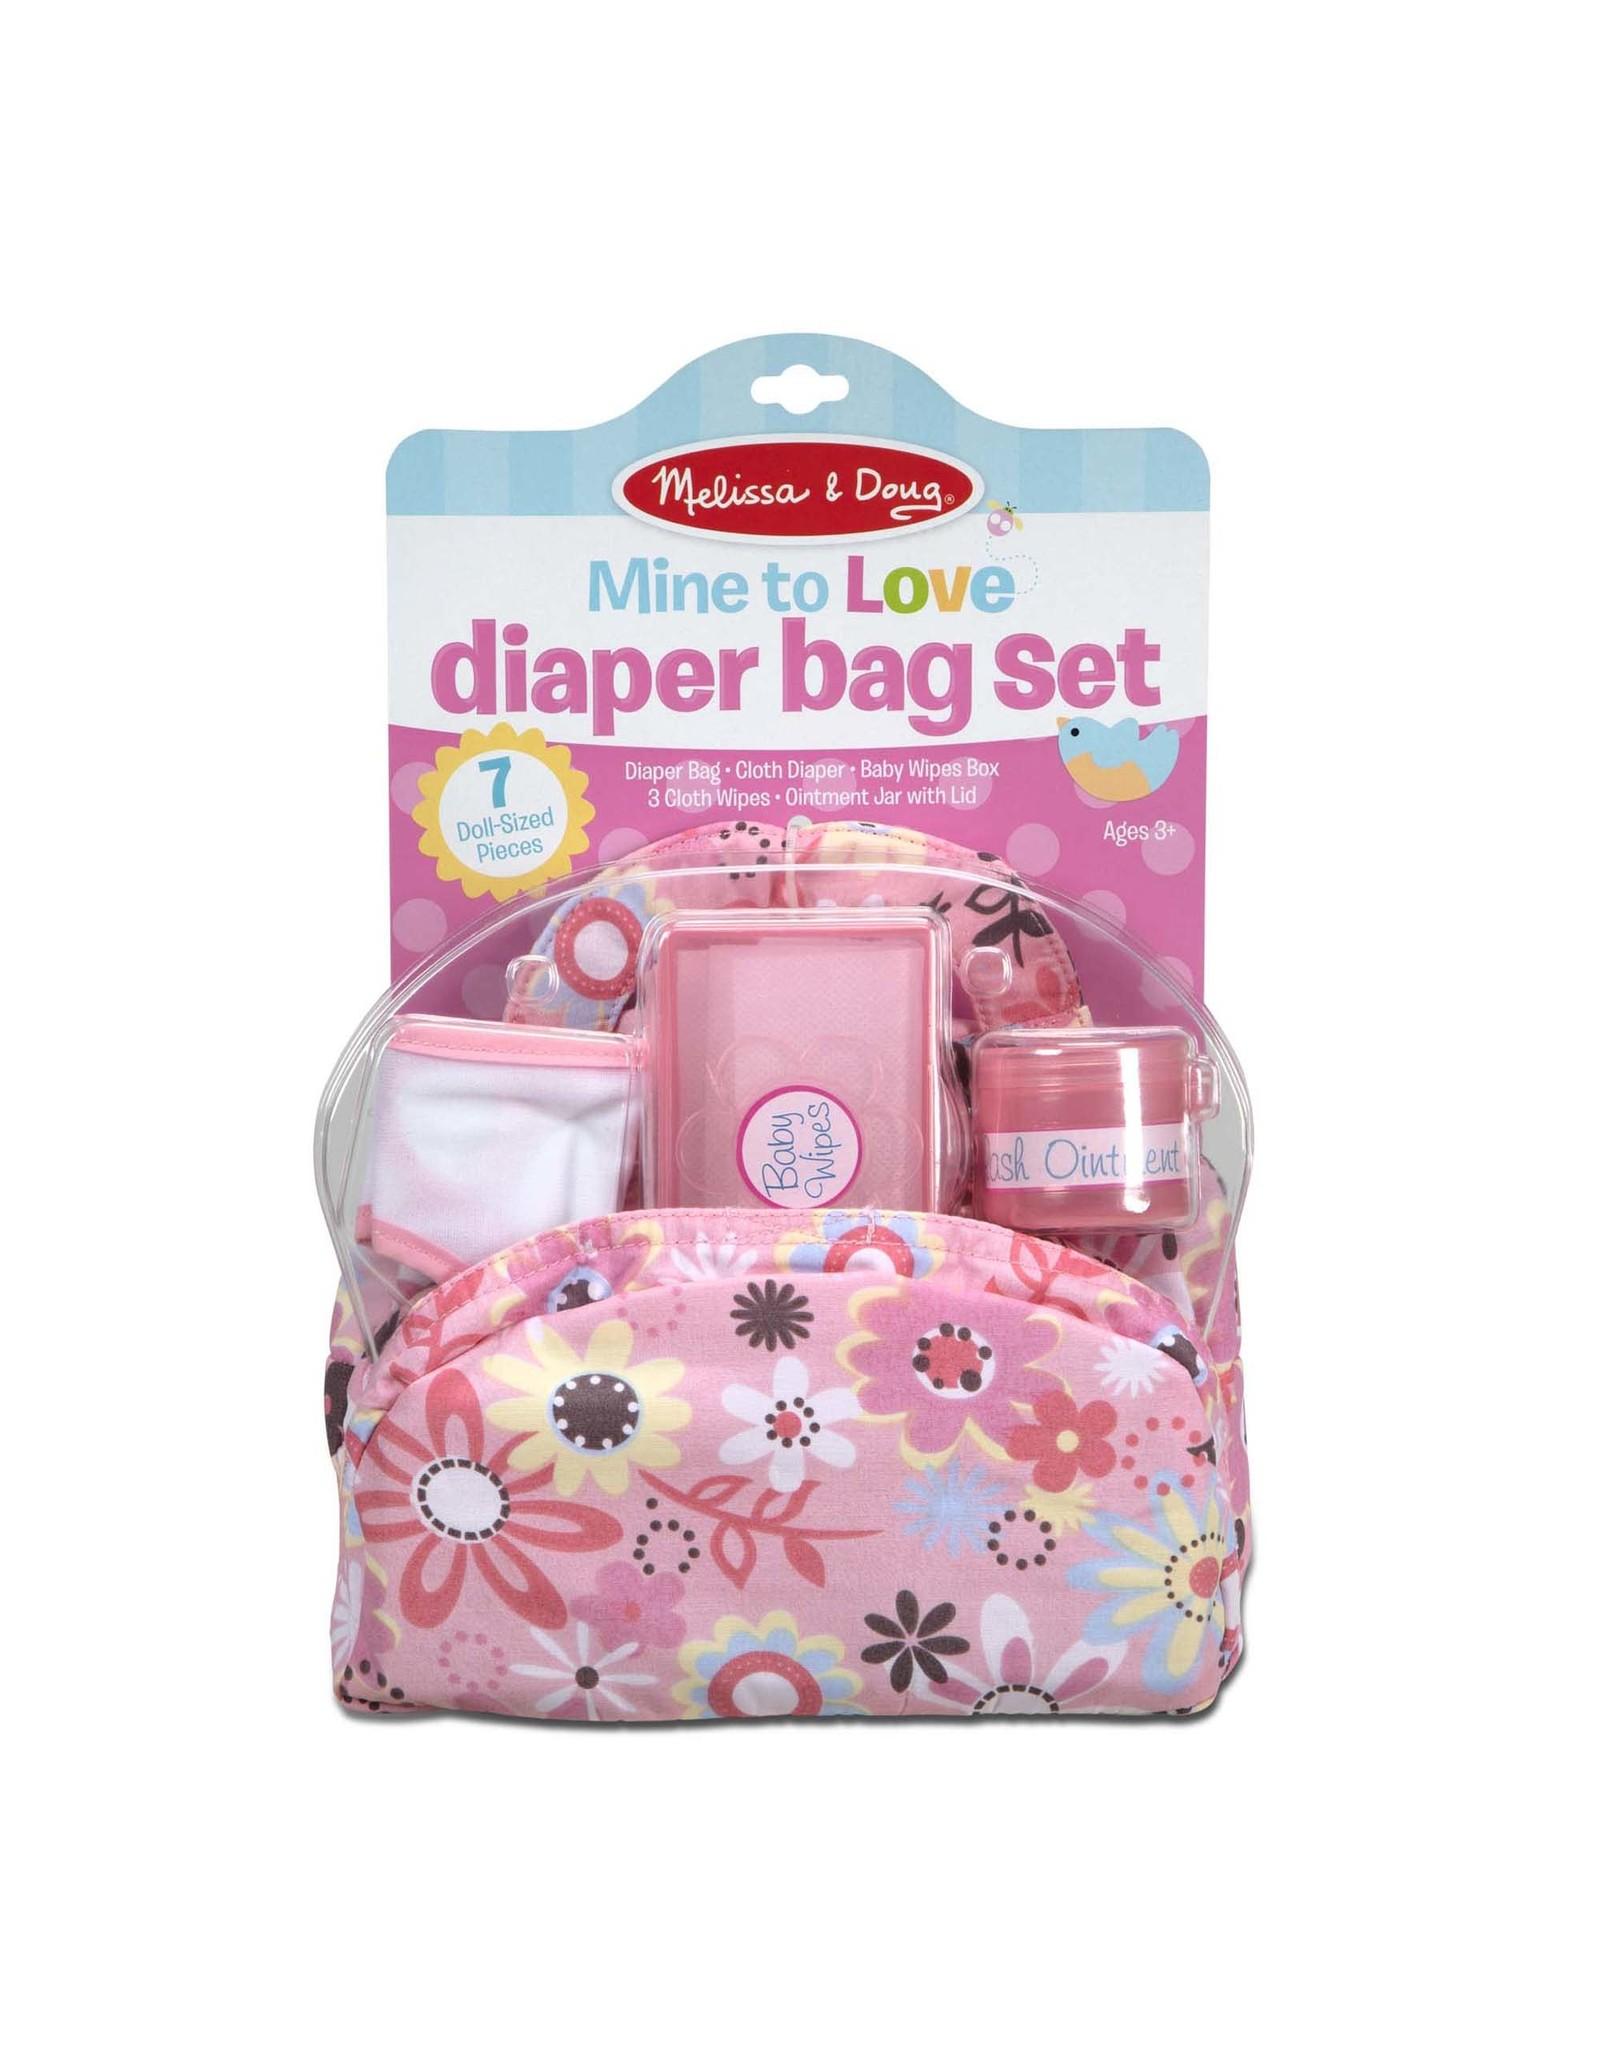 Melissa & Doug Diaper Bag Set